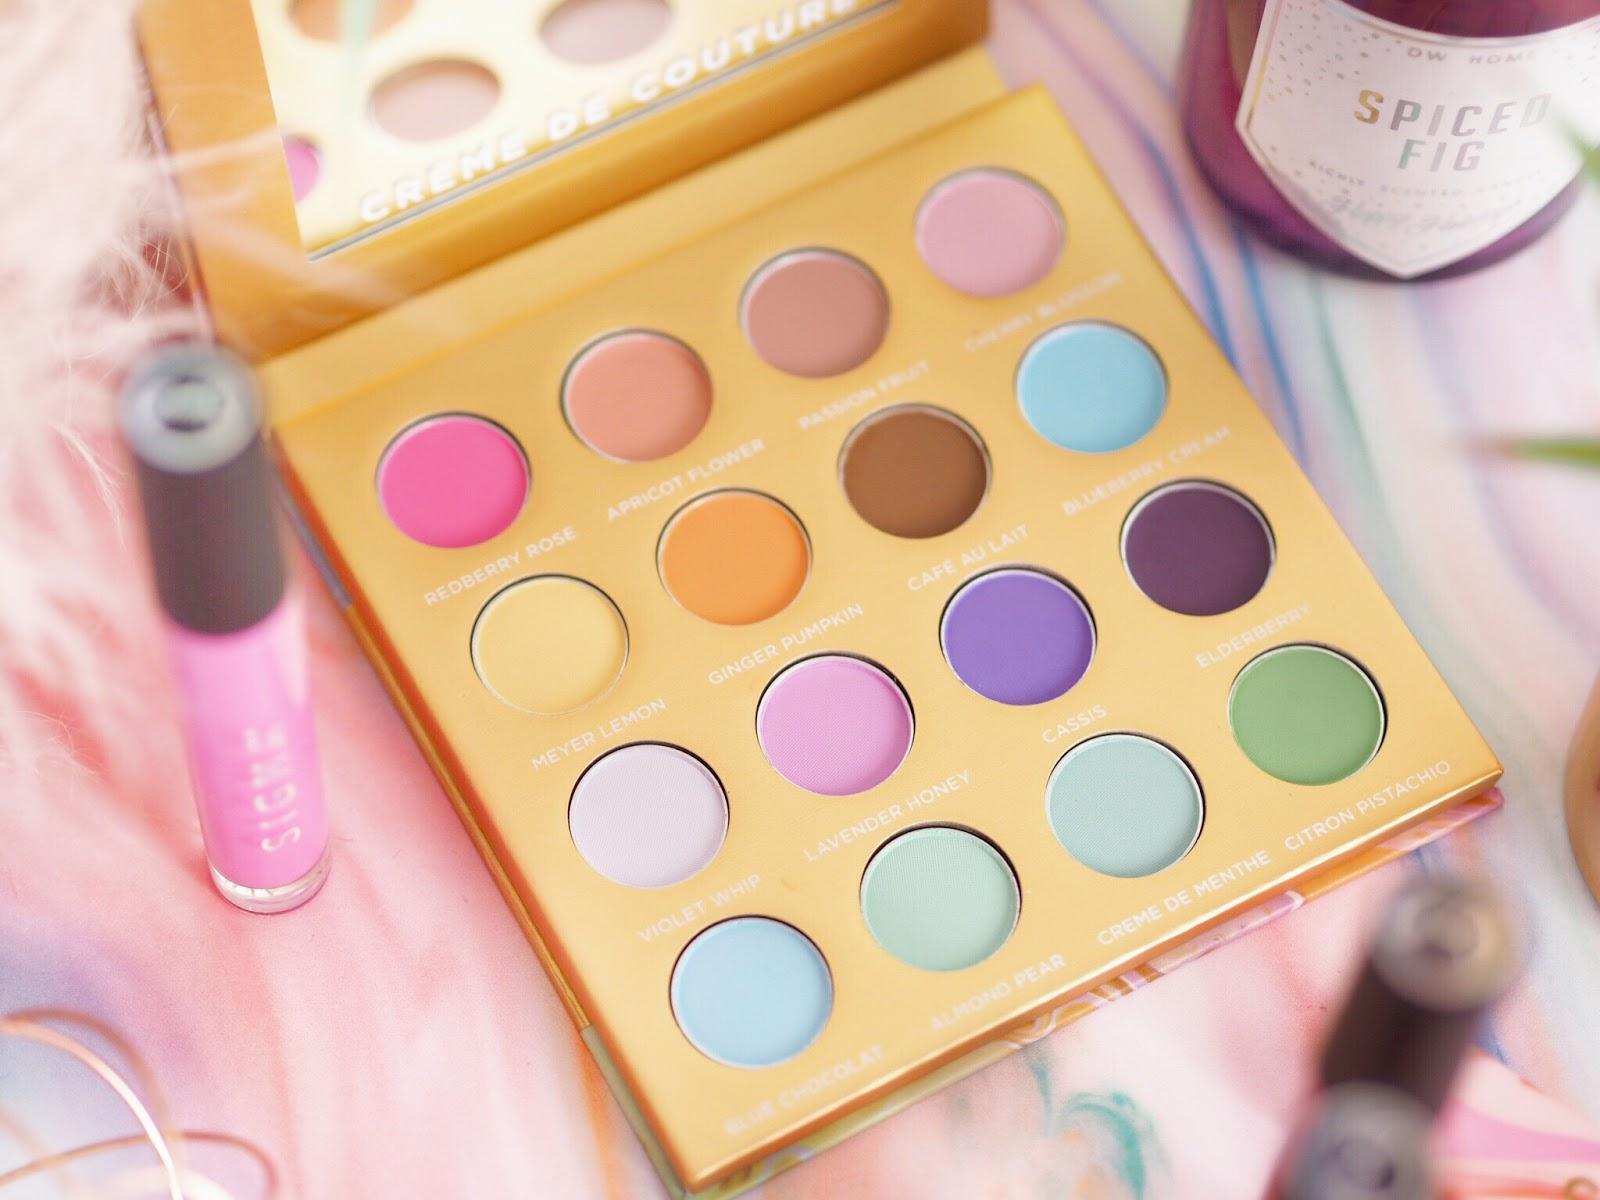 bright eyeshadow, bright eyeshadow palette, eyeshadow palette, sigma, sigma eyeshadow